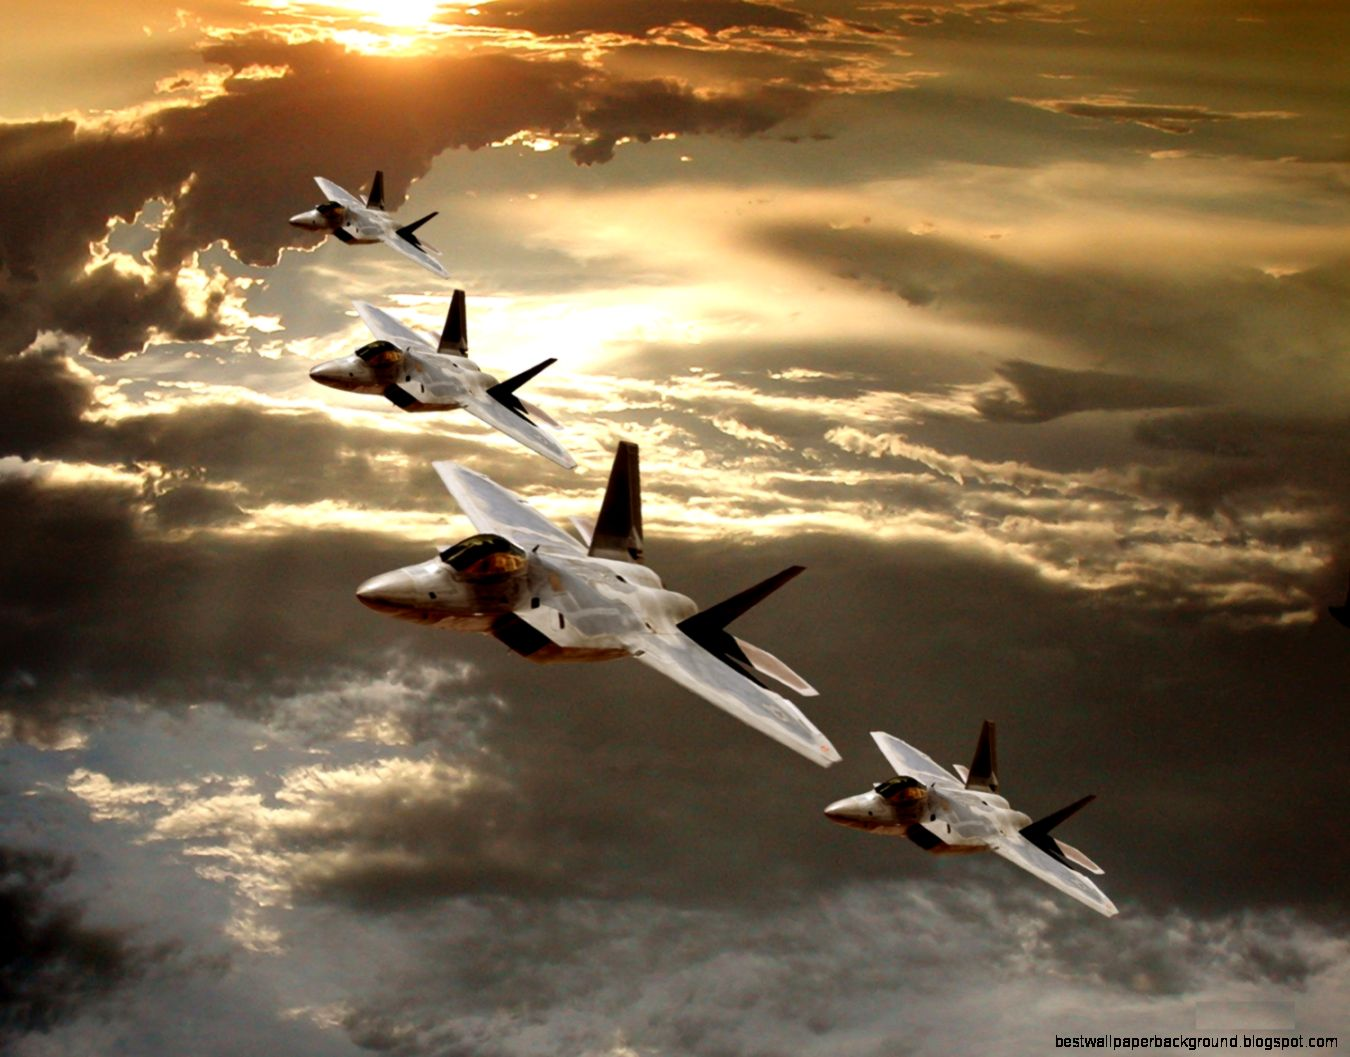 F 22 Raptor Air Force Hd Wallpaper | Best Wallpaper Background